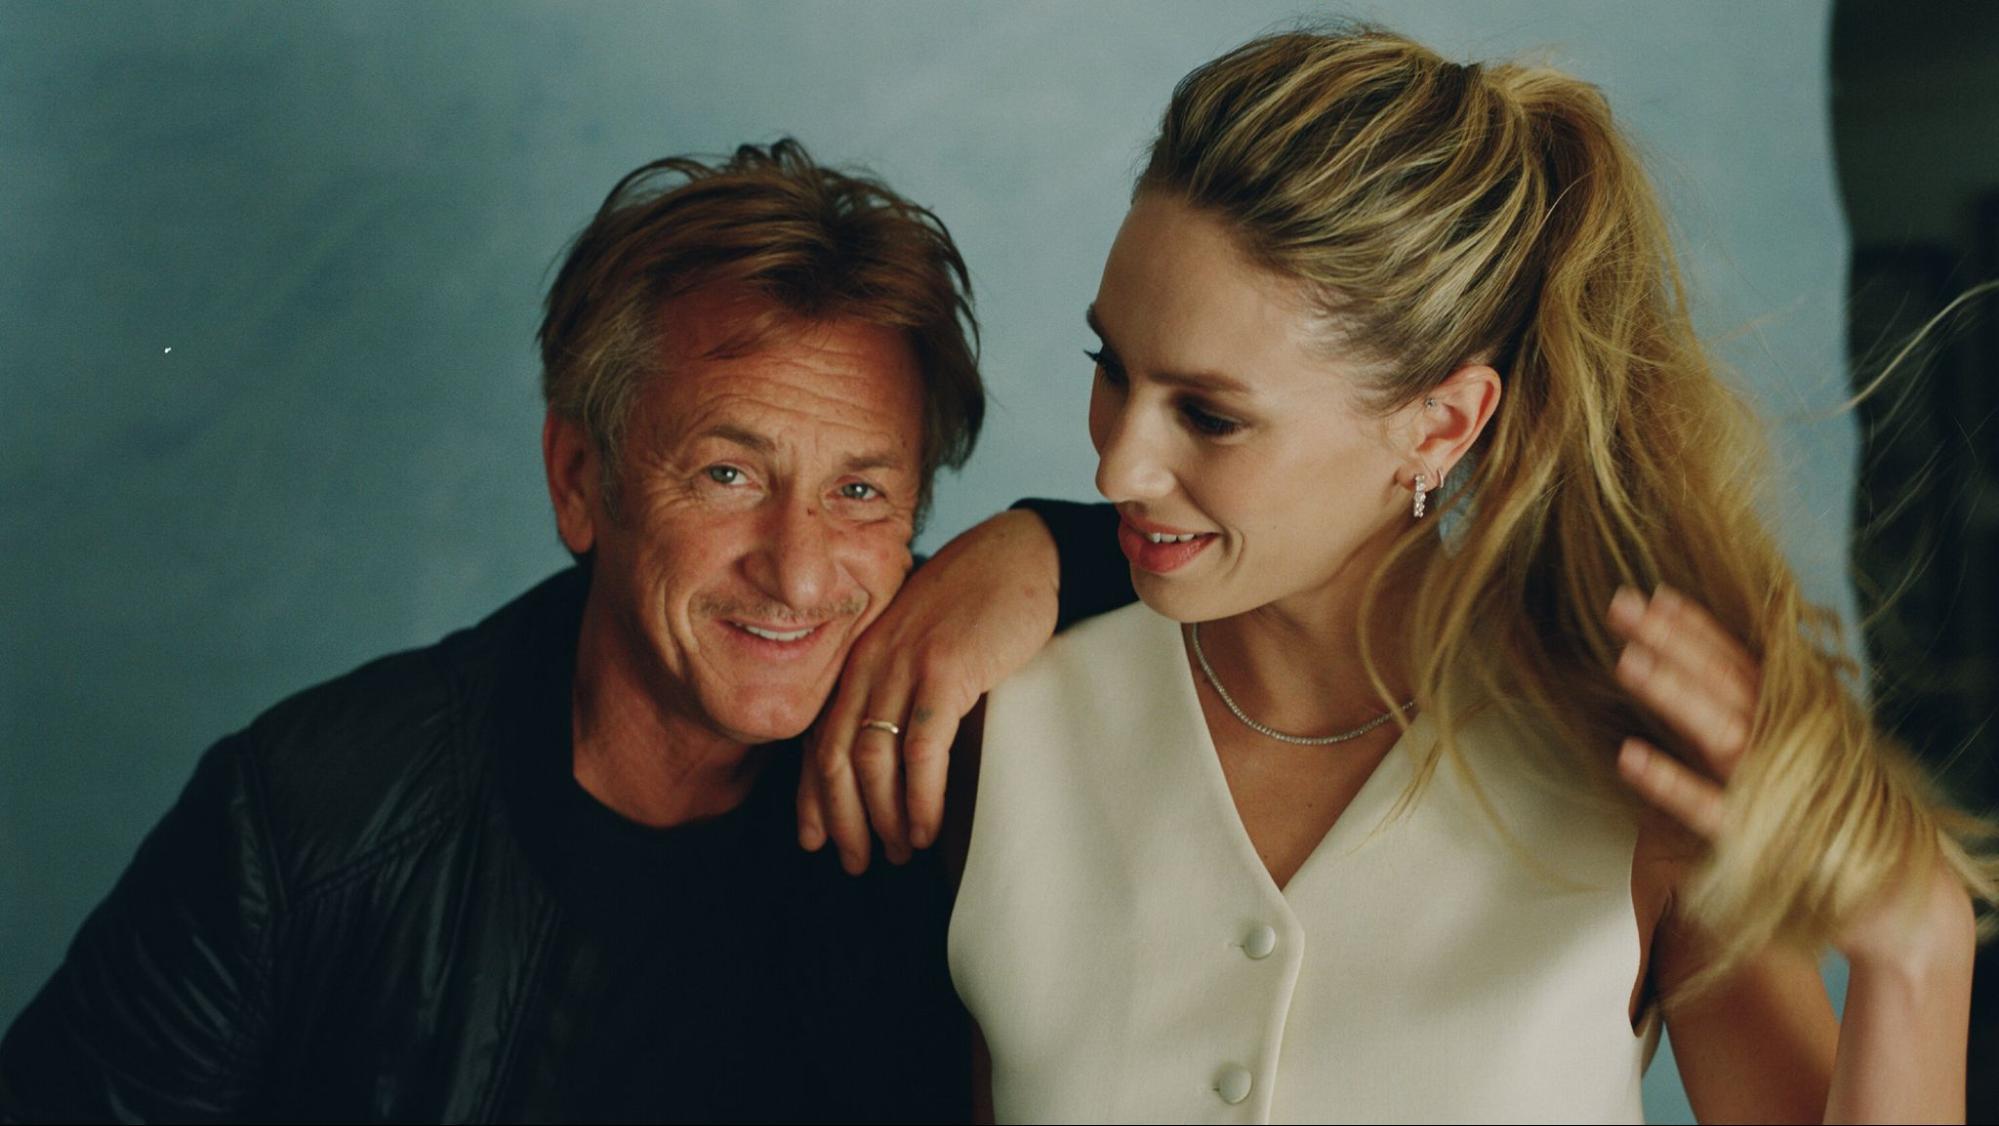 Sean Penn and his daughter, Dylan Penn.